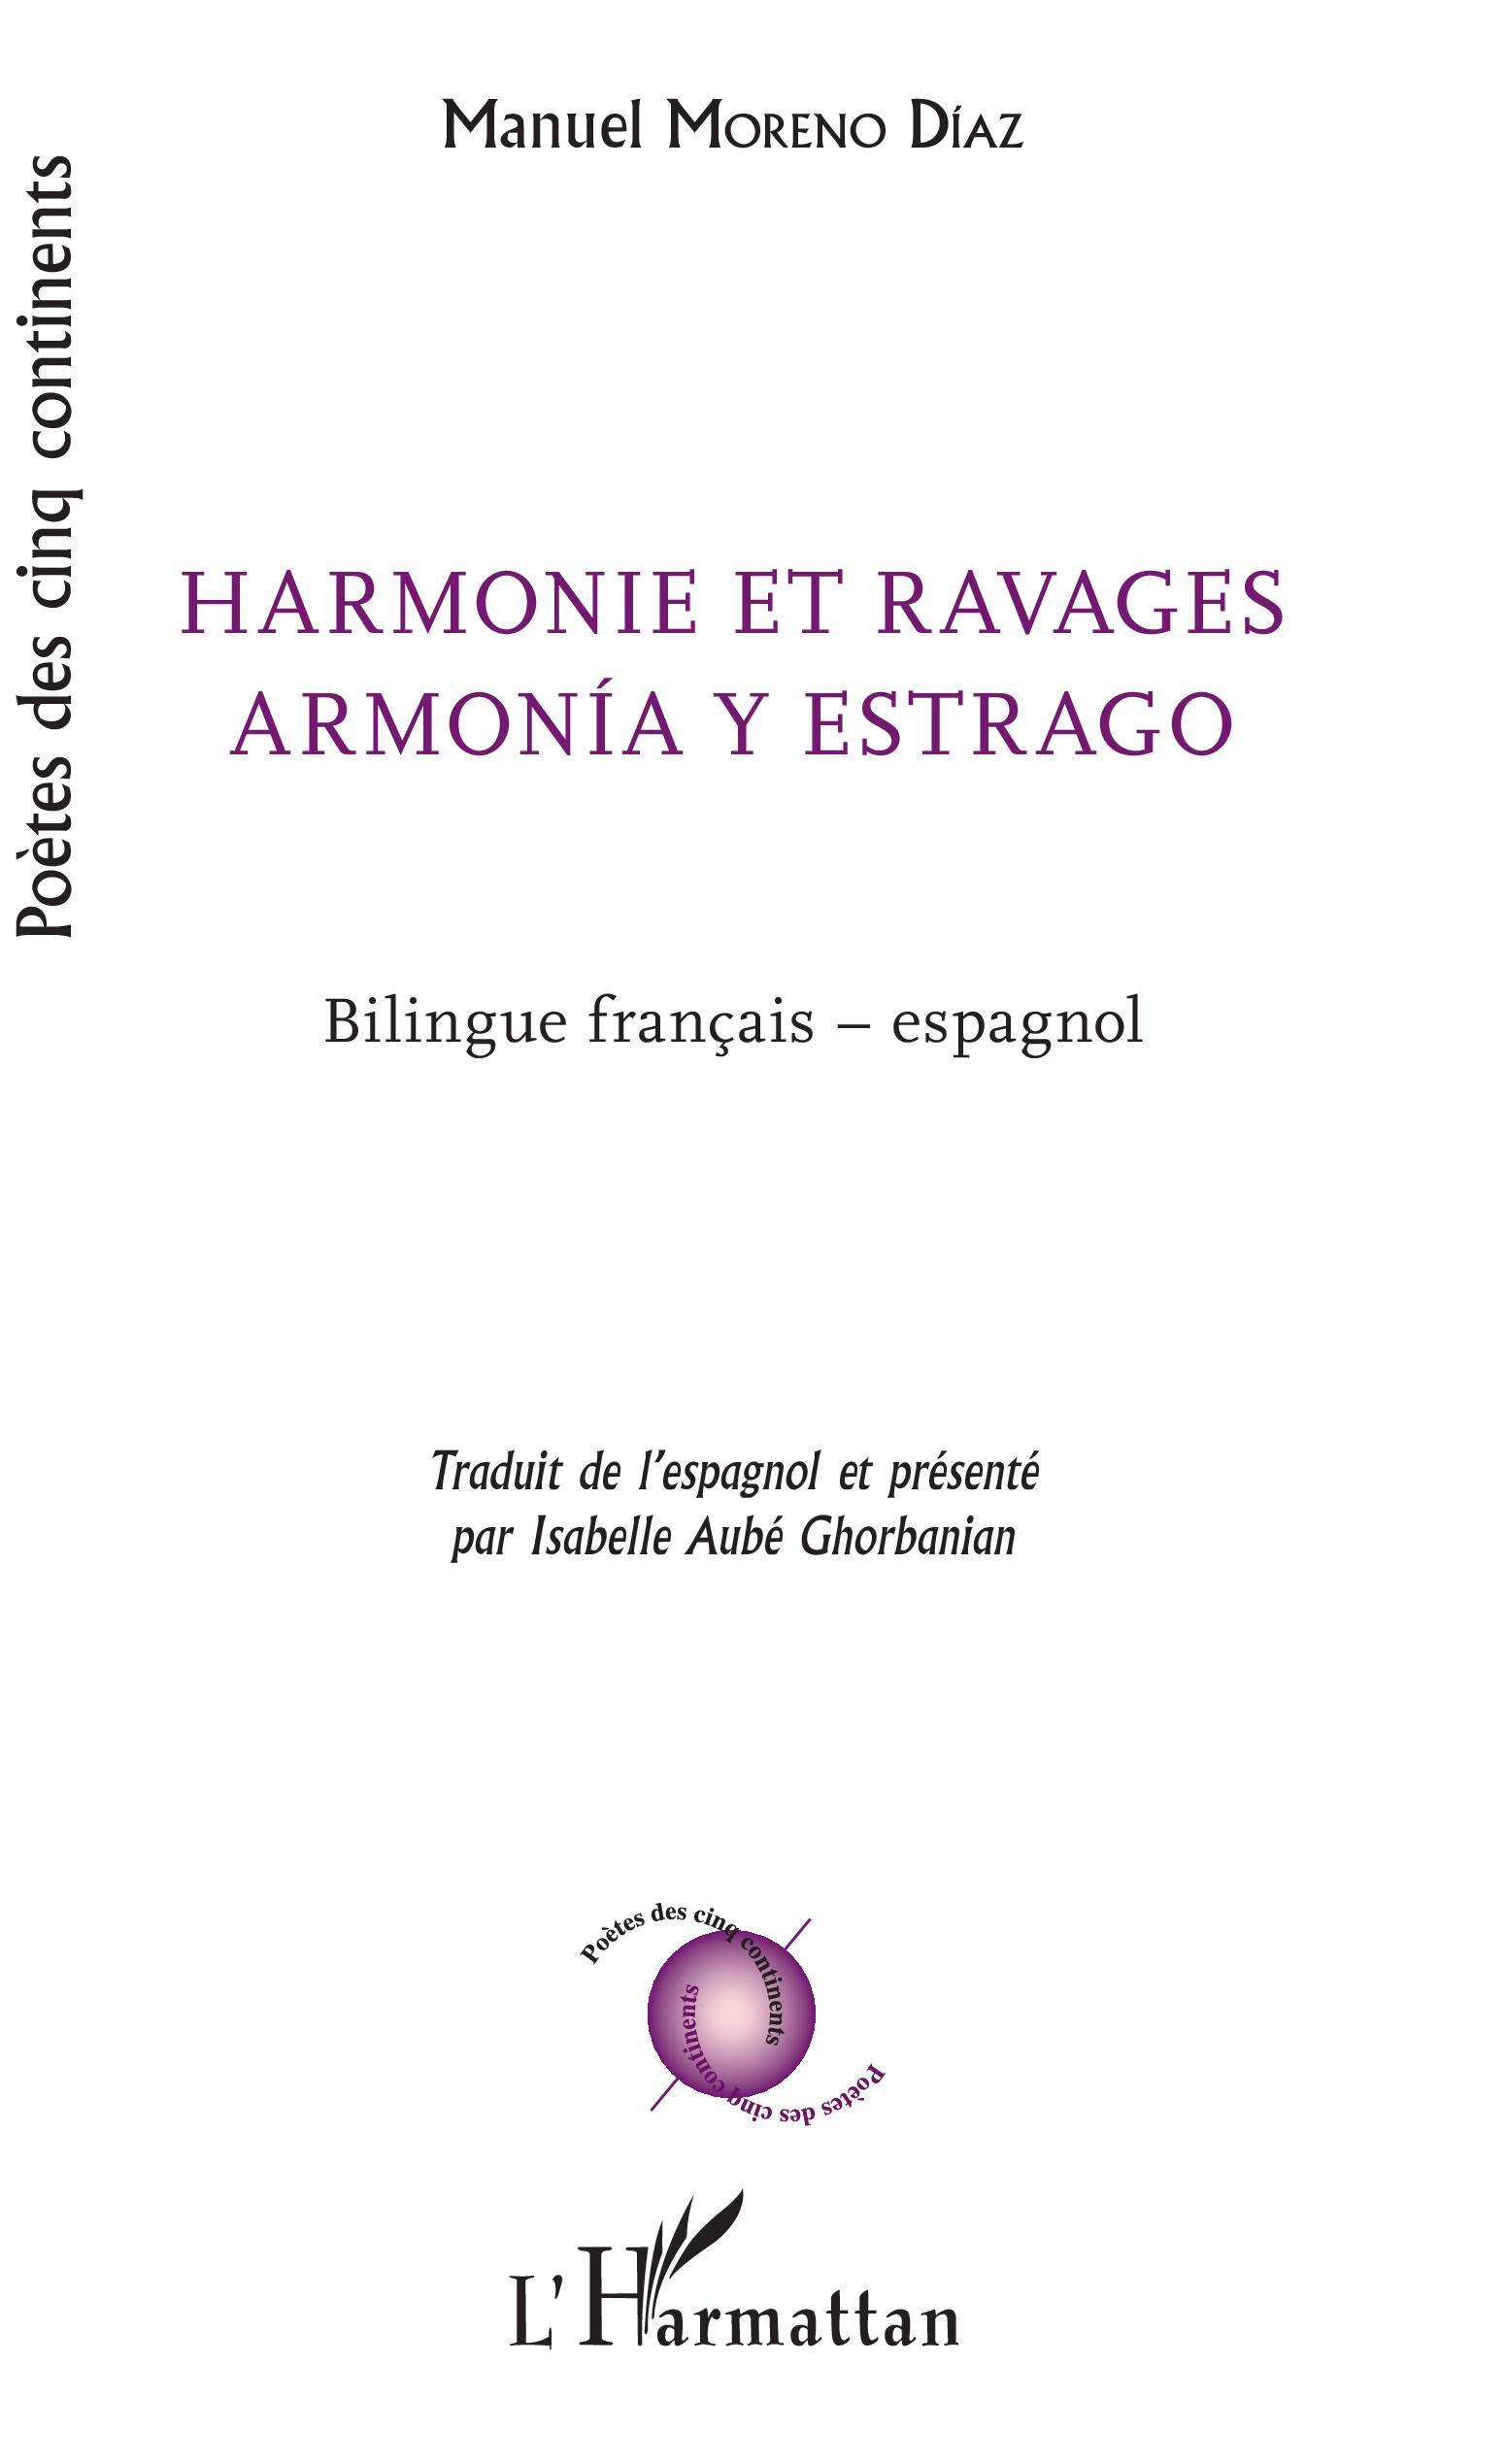 HARMONIE ET RAVAGES - ARMONIA Y ESTRAGO - BILINGUE FRANCAIS - ESPAGNOL